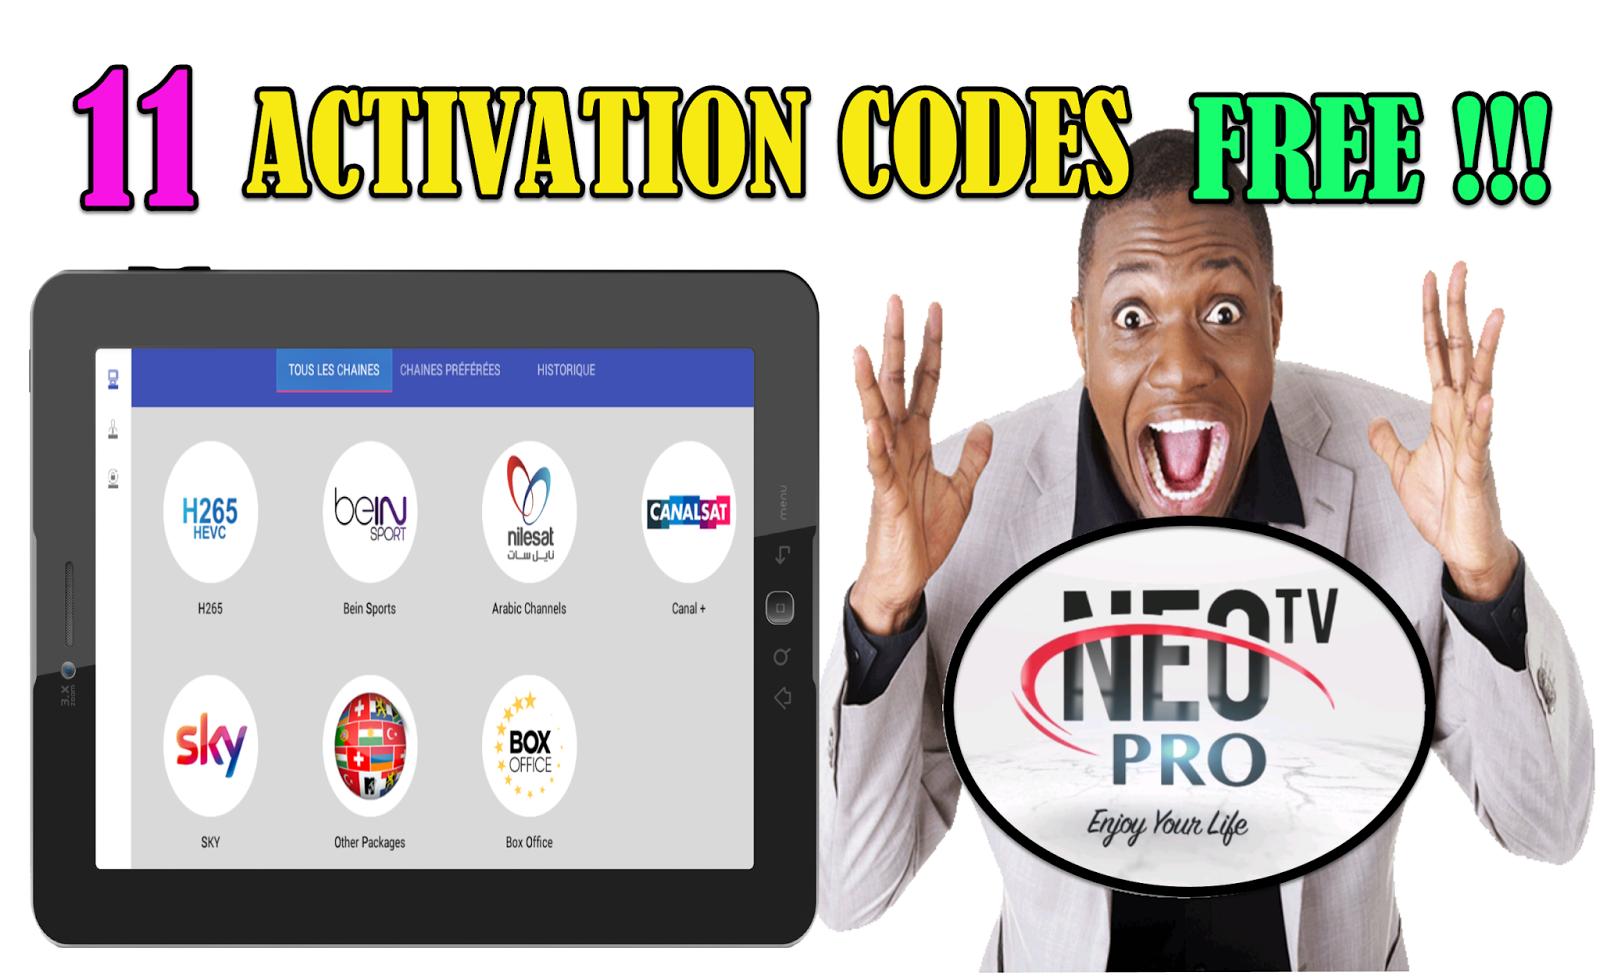 Neo Iptv Pro Premium Apk Iptv Over 5000 Channels 11